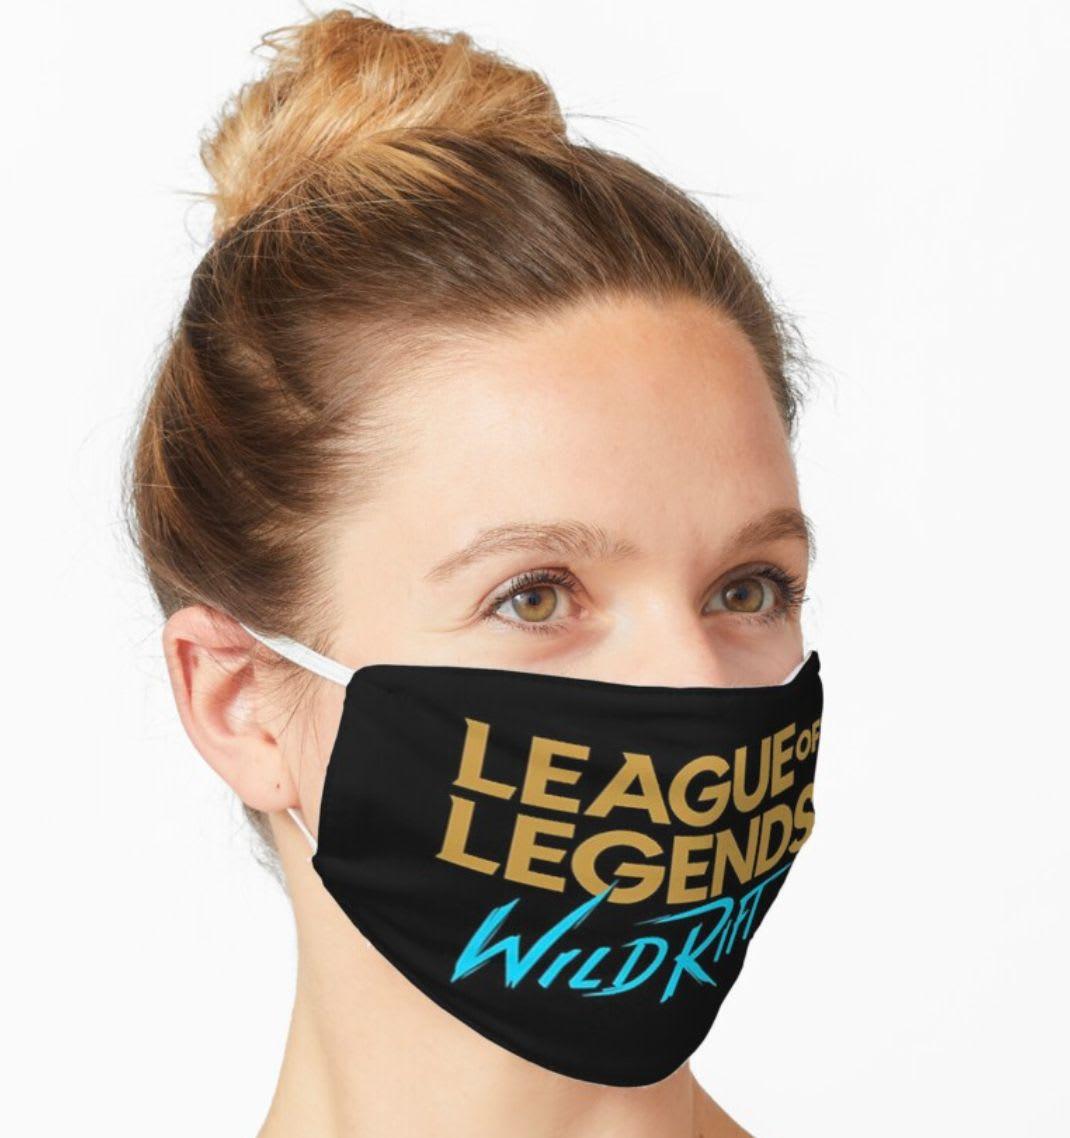 Descubre la mascarilla con el logotipo de League of Legends: Wild Rift de Vincent Sayson en Redbubble.